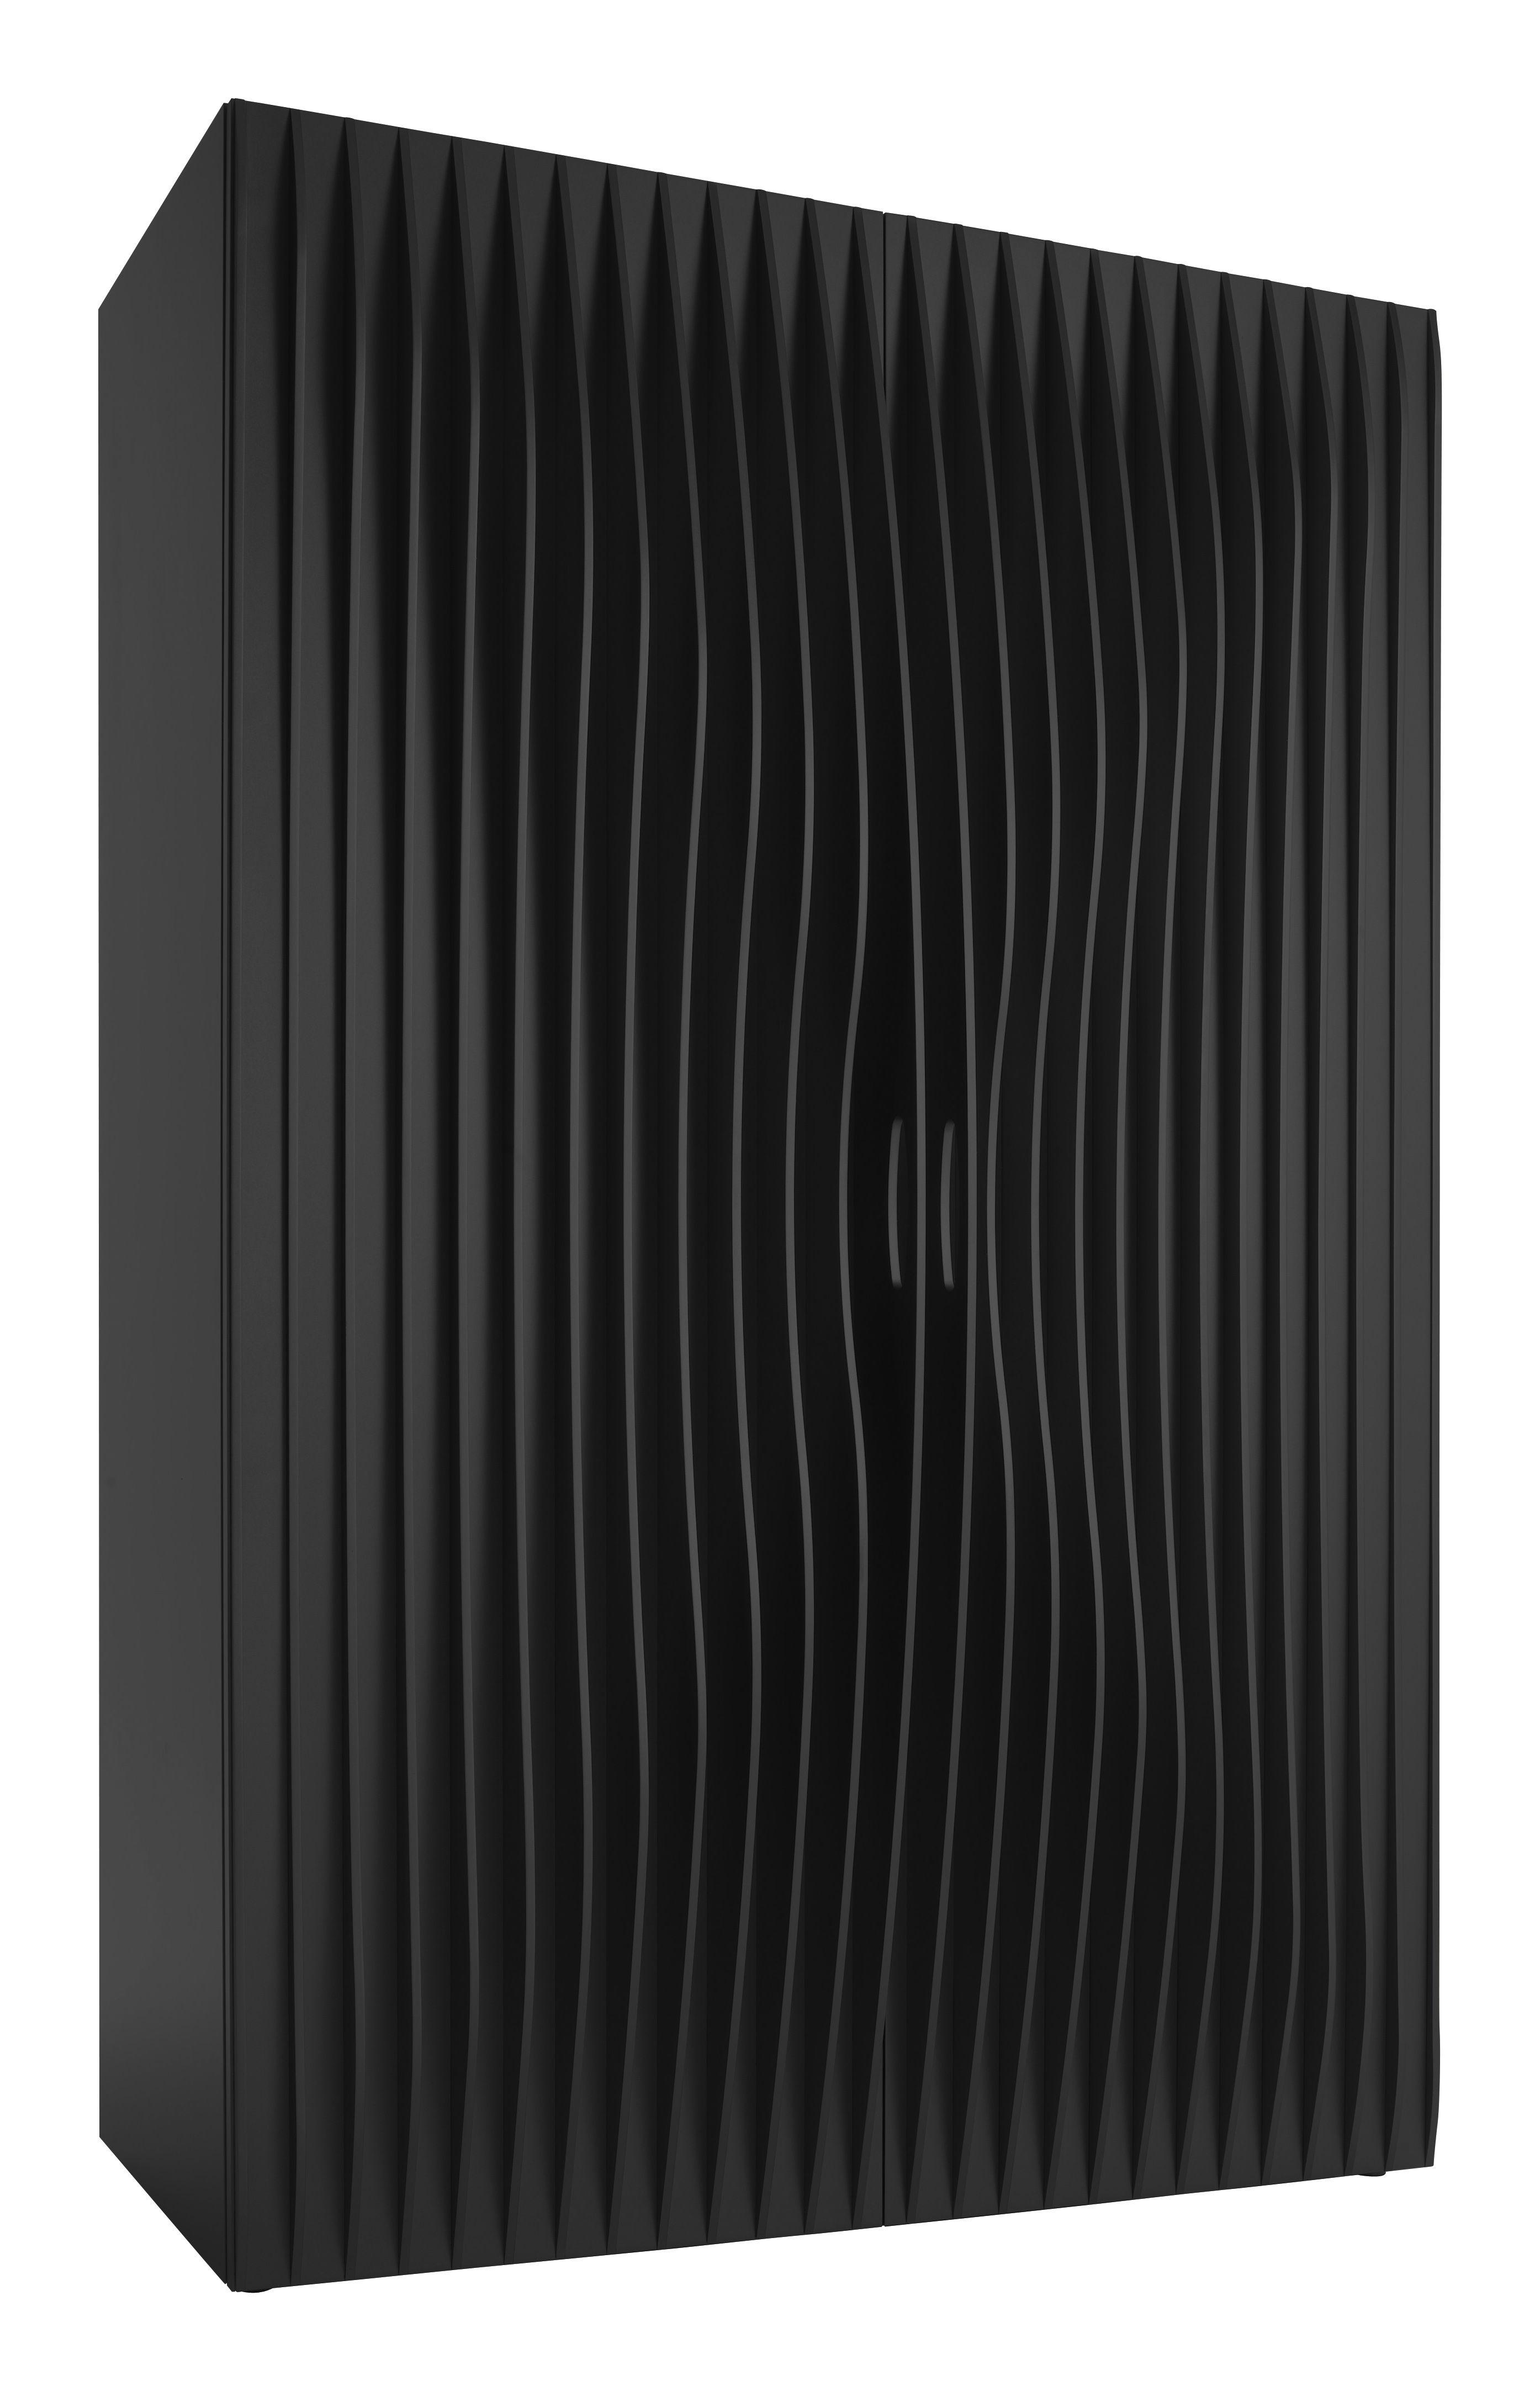 Furniture - Dressers & Storage Units - Blend Wardrobe - 2 doors by Horm - Black - MDF